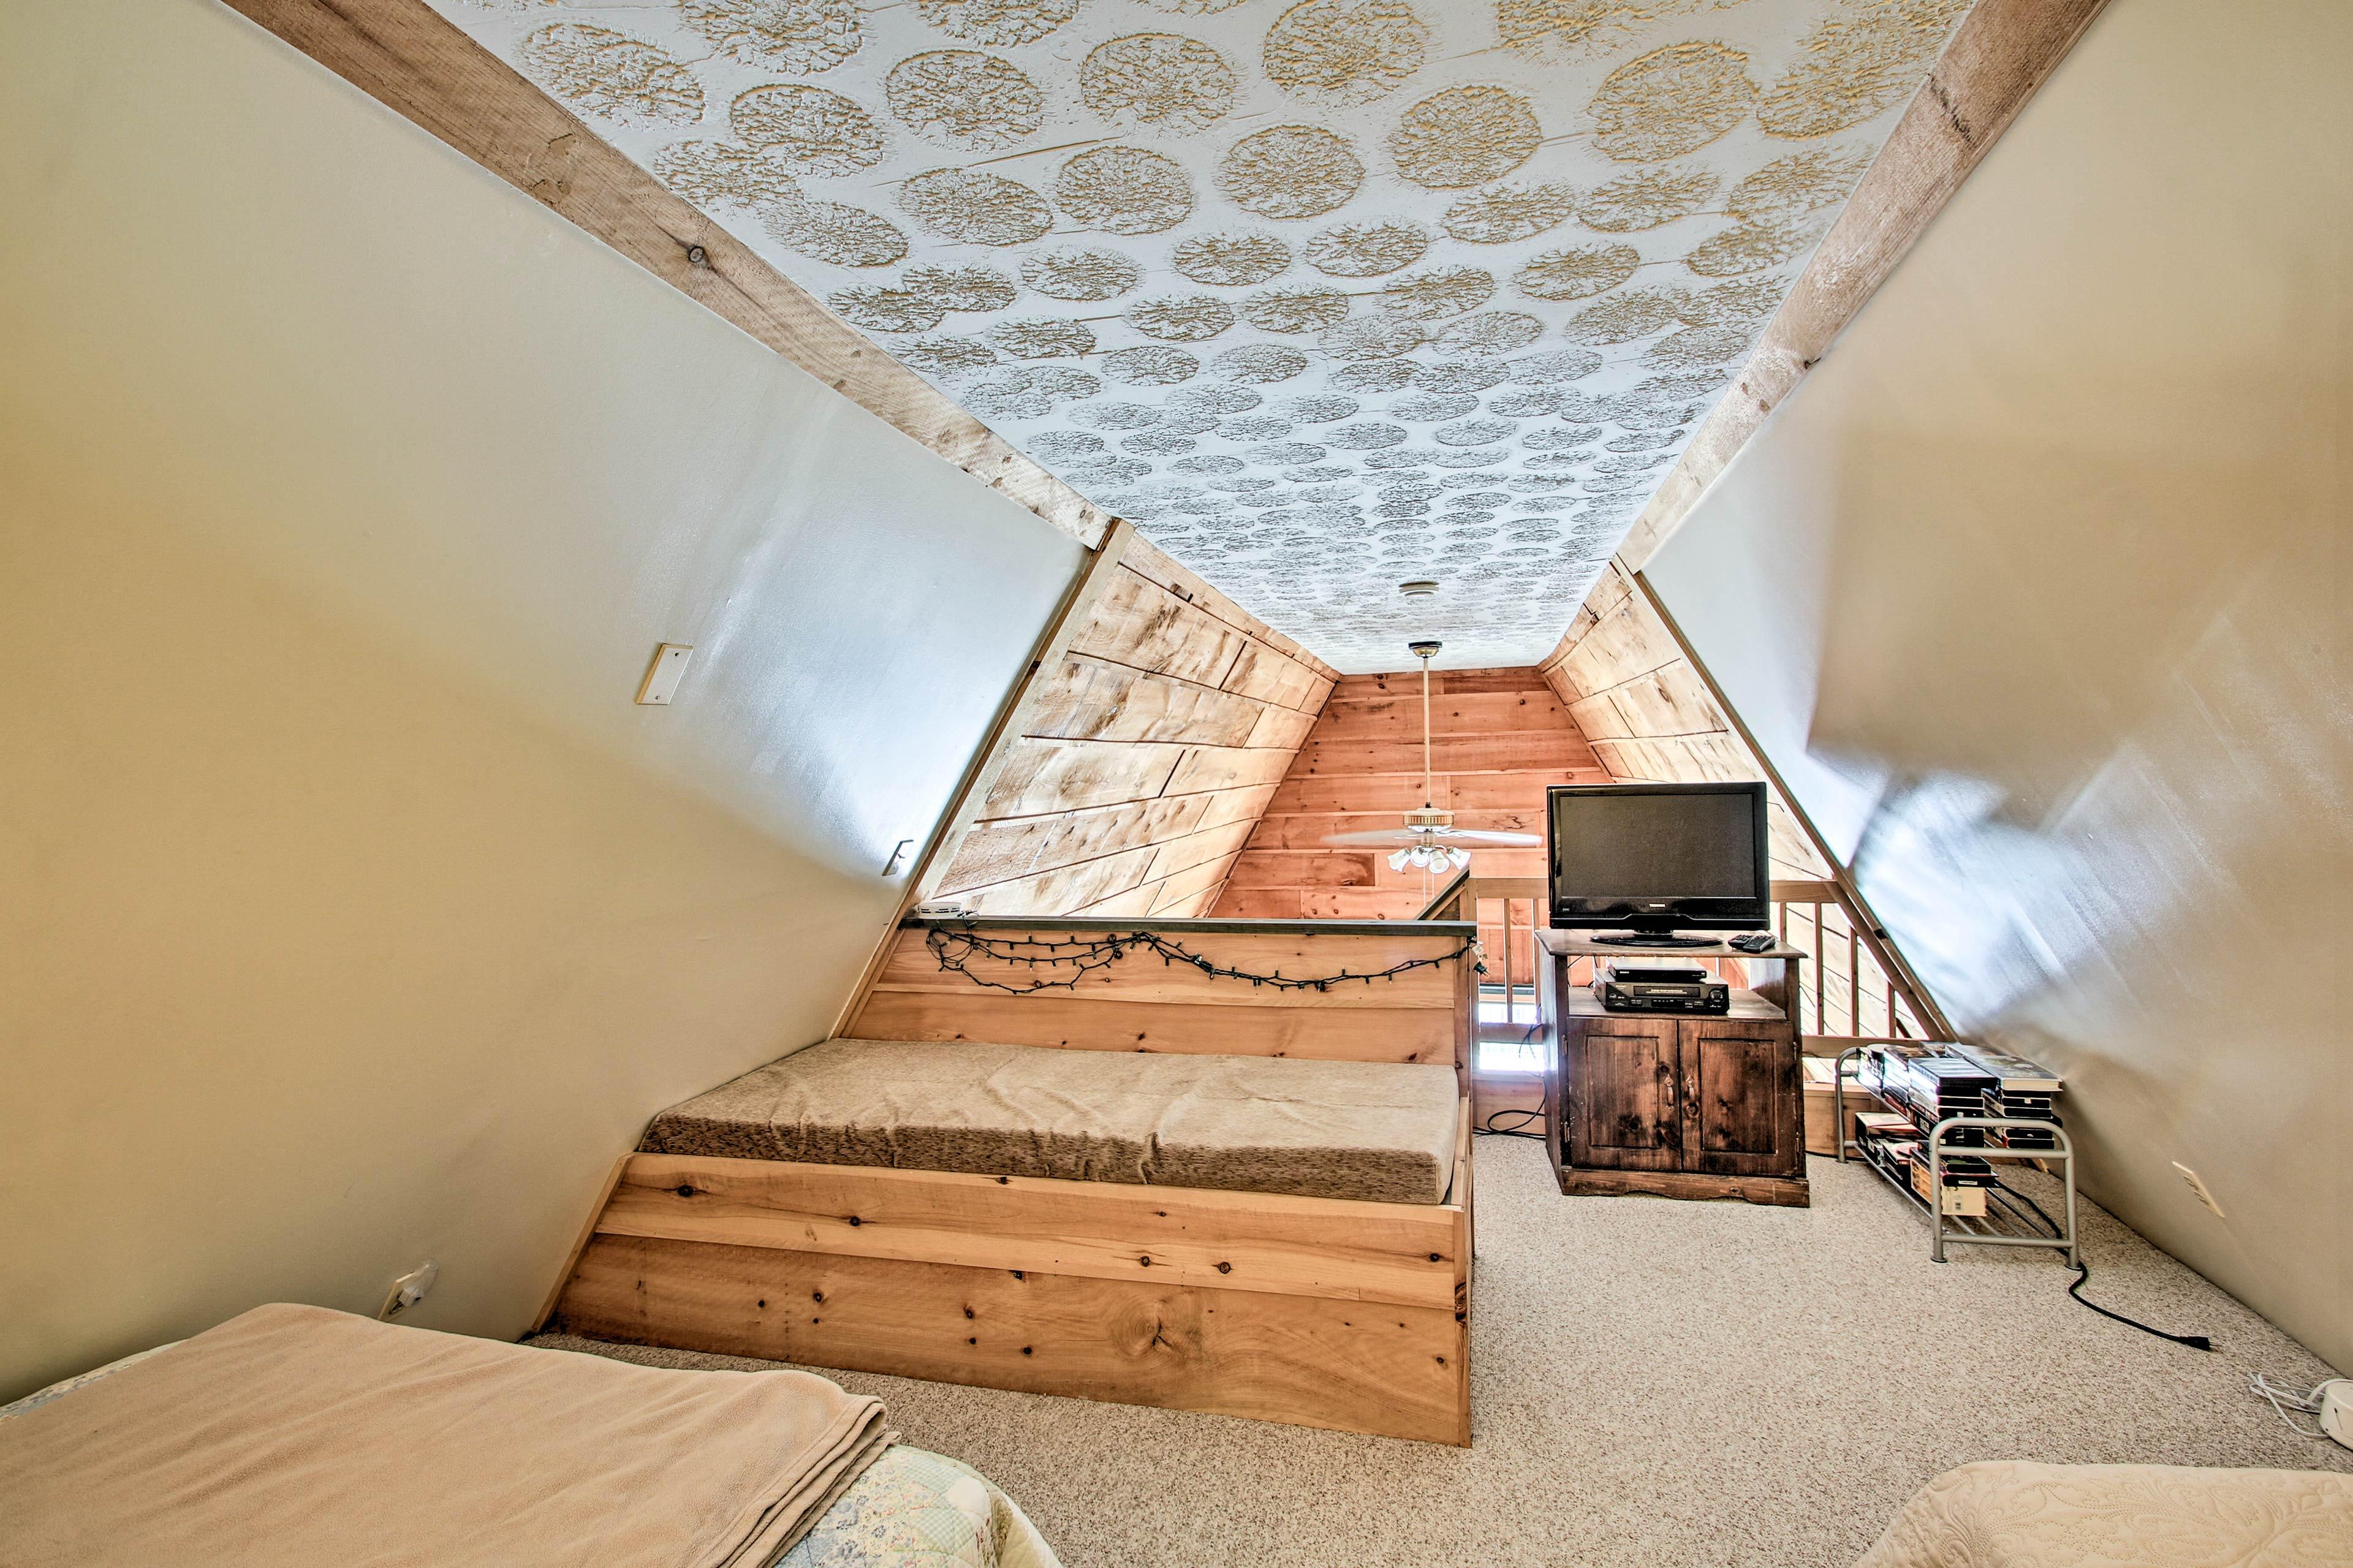 Kids will love spending the night in the loft.